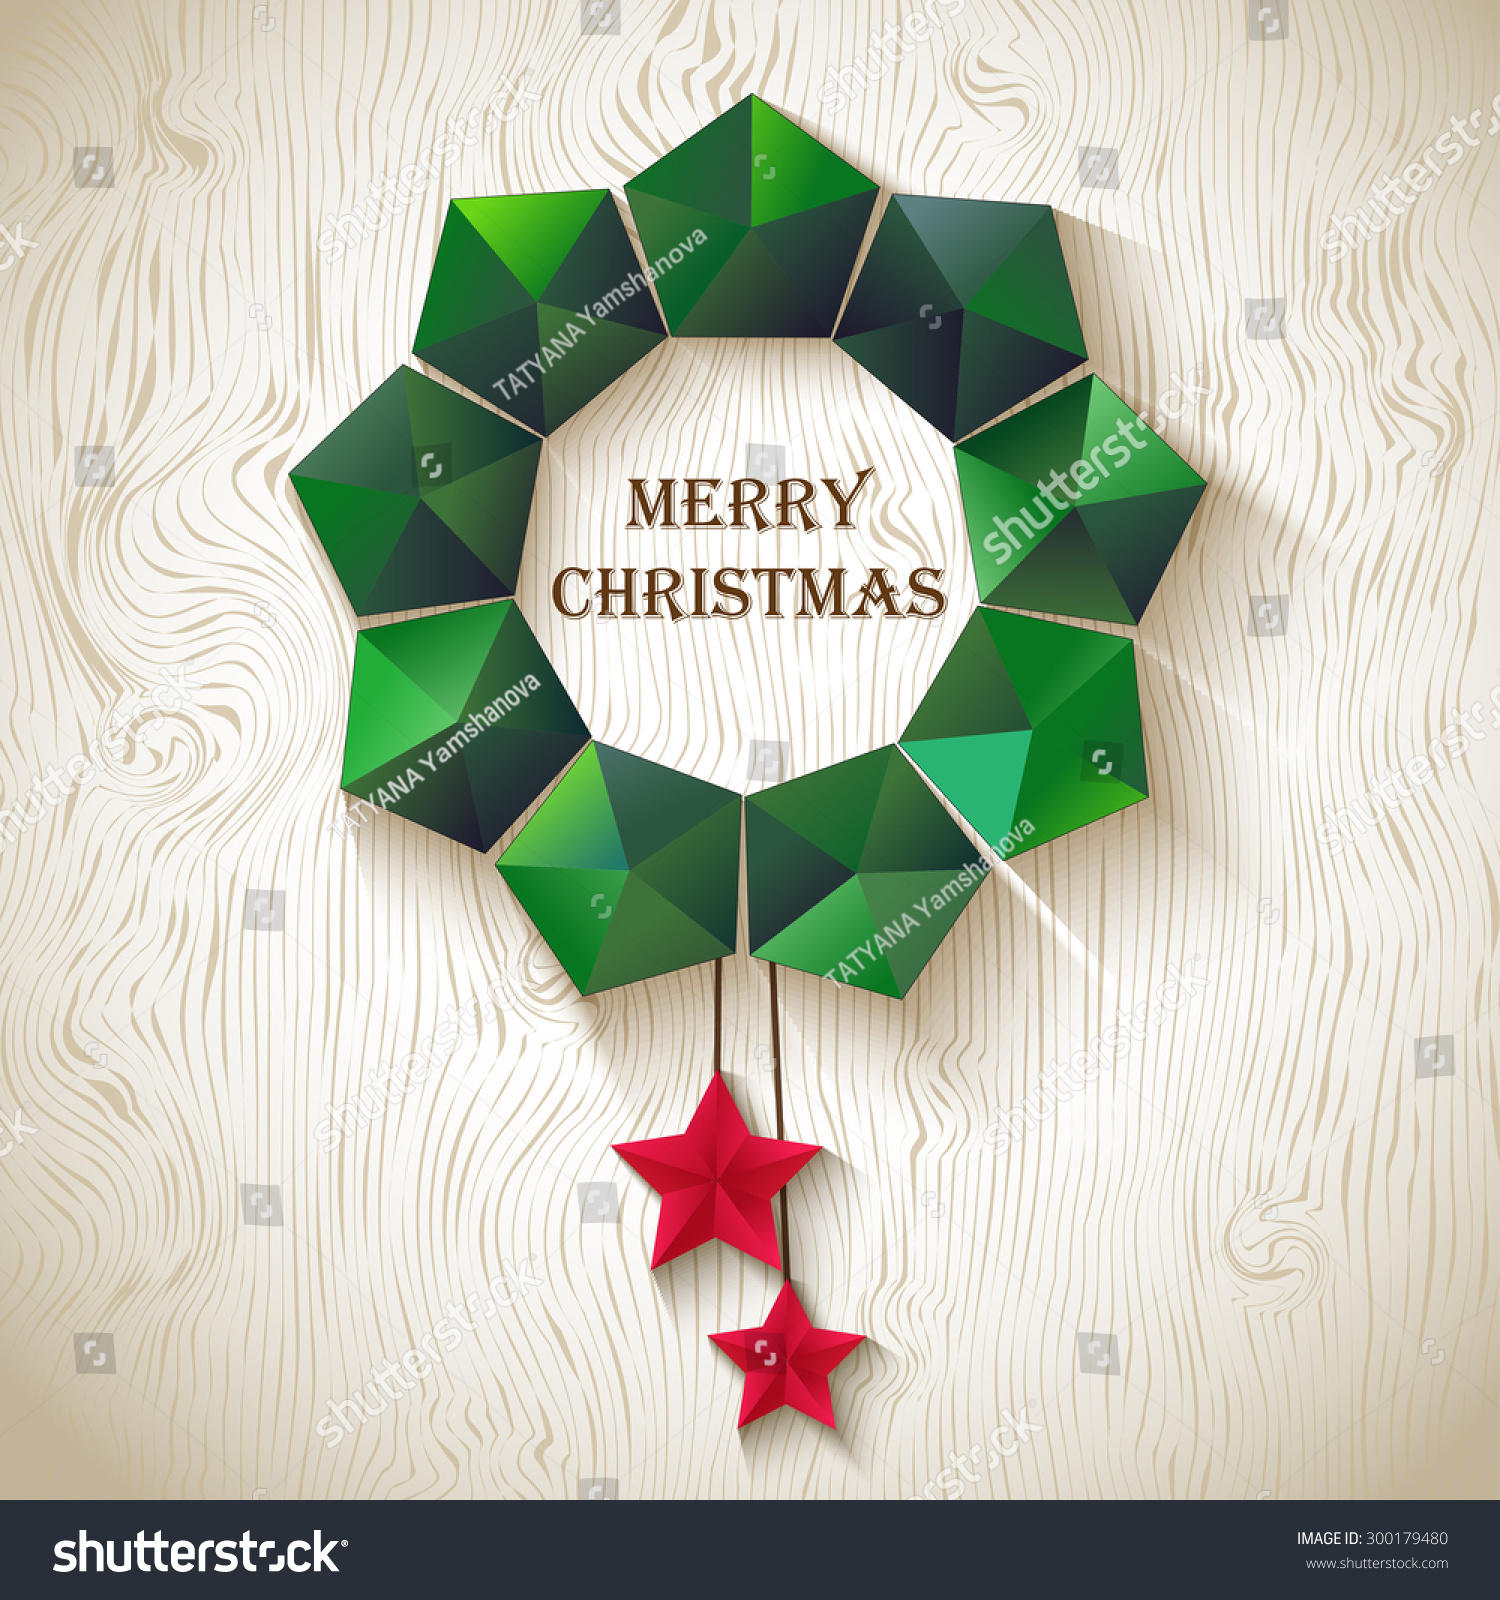 Christmas Wreath Geometric Shapes Stock Vector